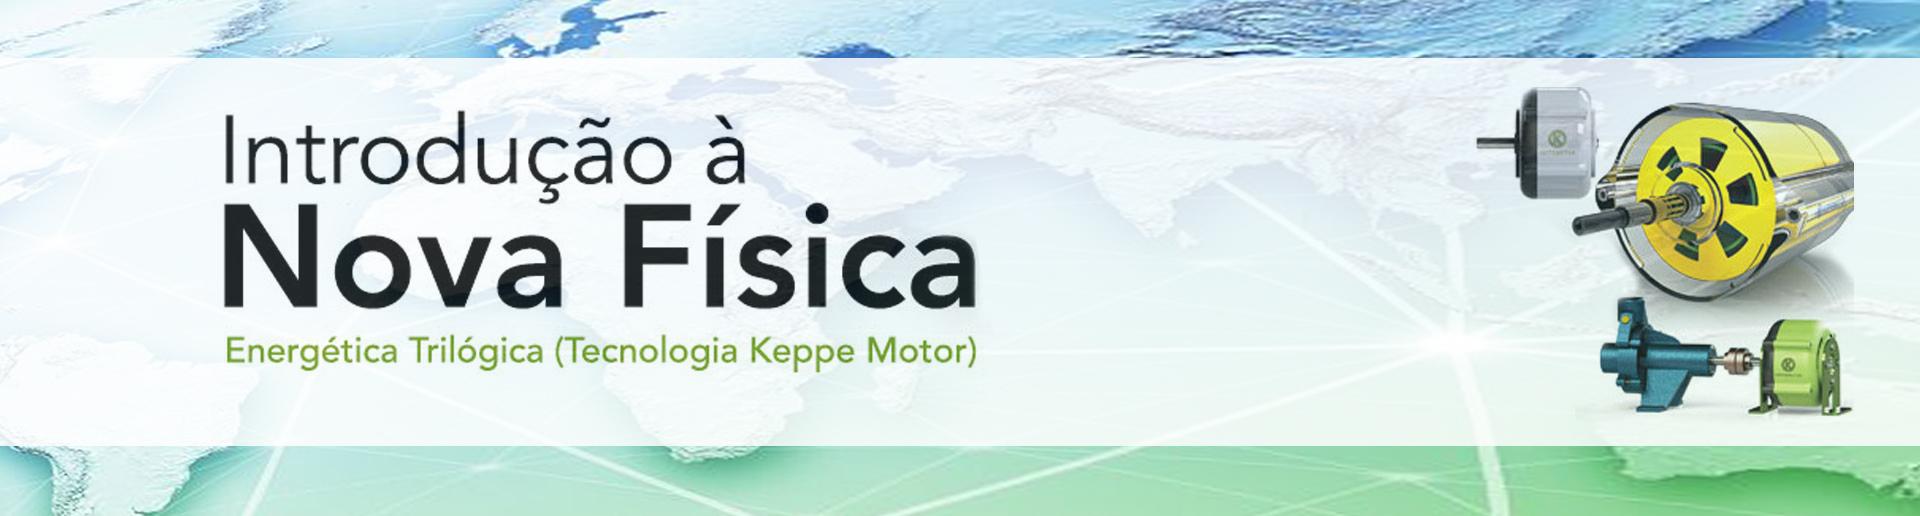 banner-site-curso-nova-fisica-dez2016